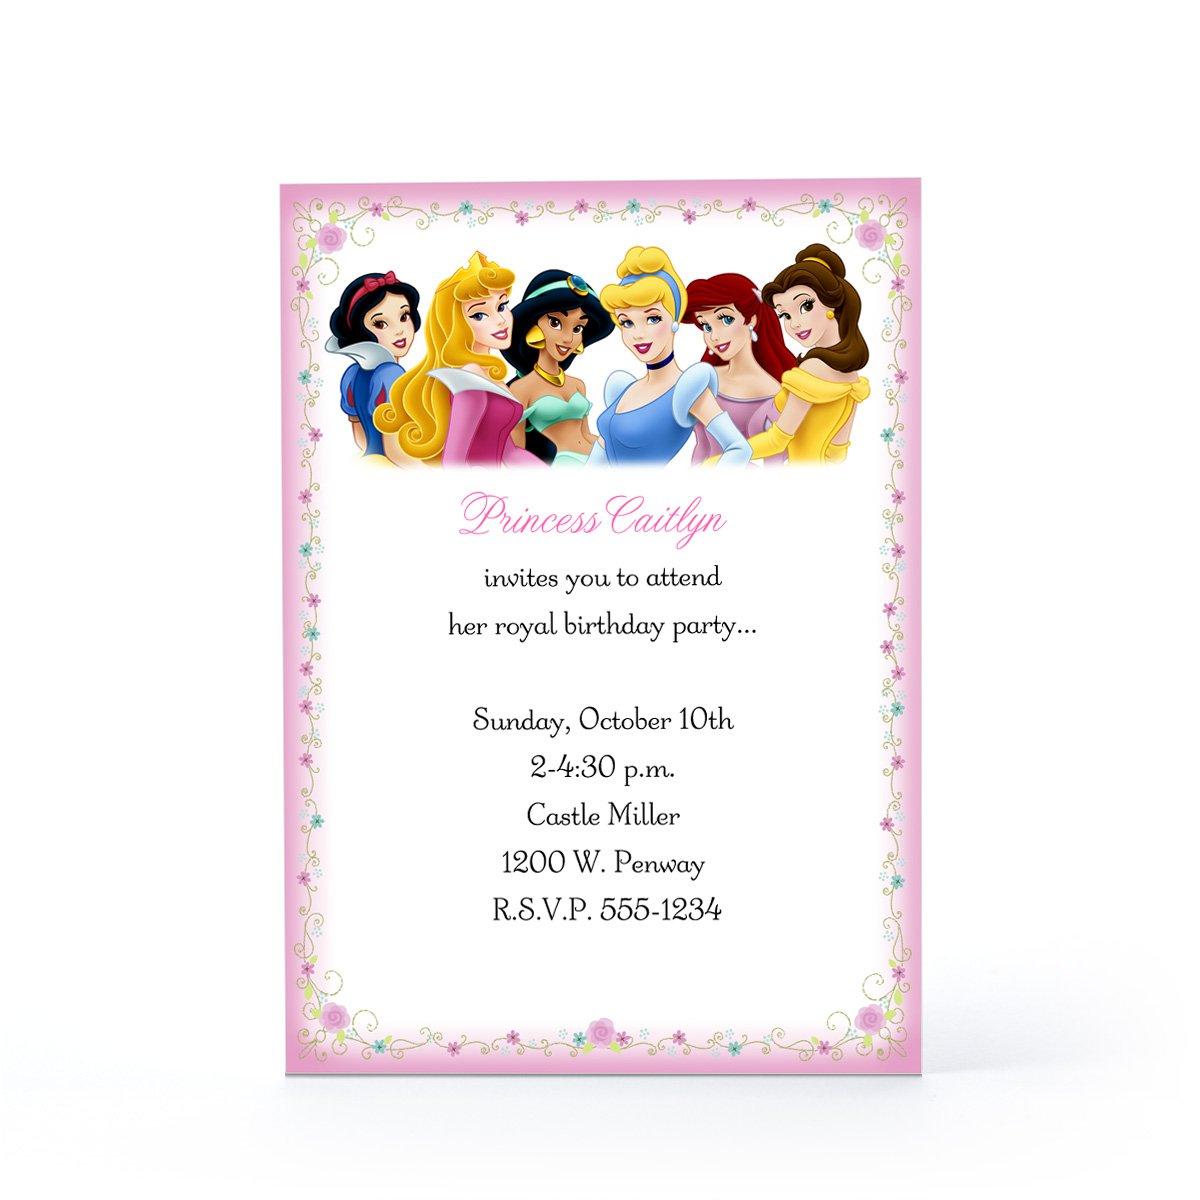 Free Printable Disney Princess Birthday Party Invitations